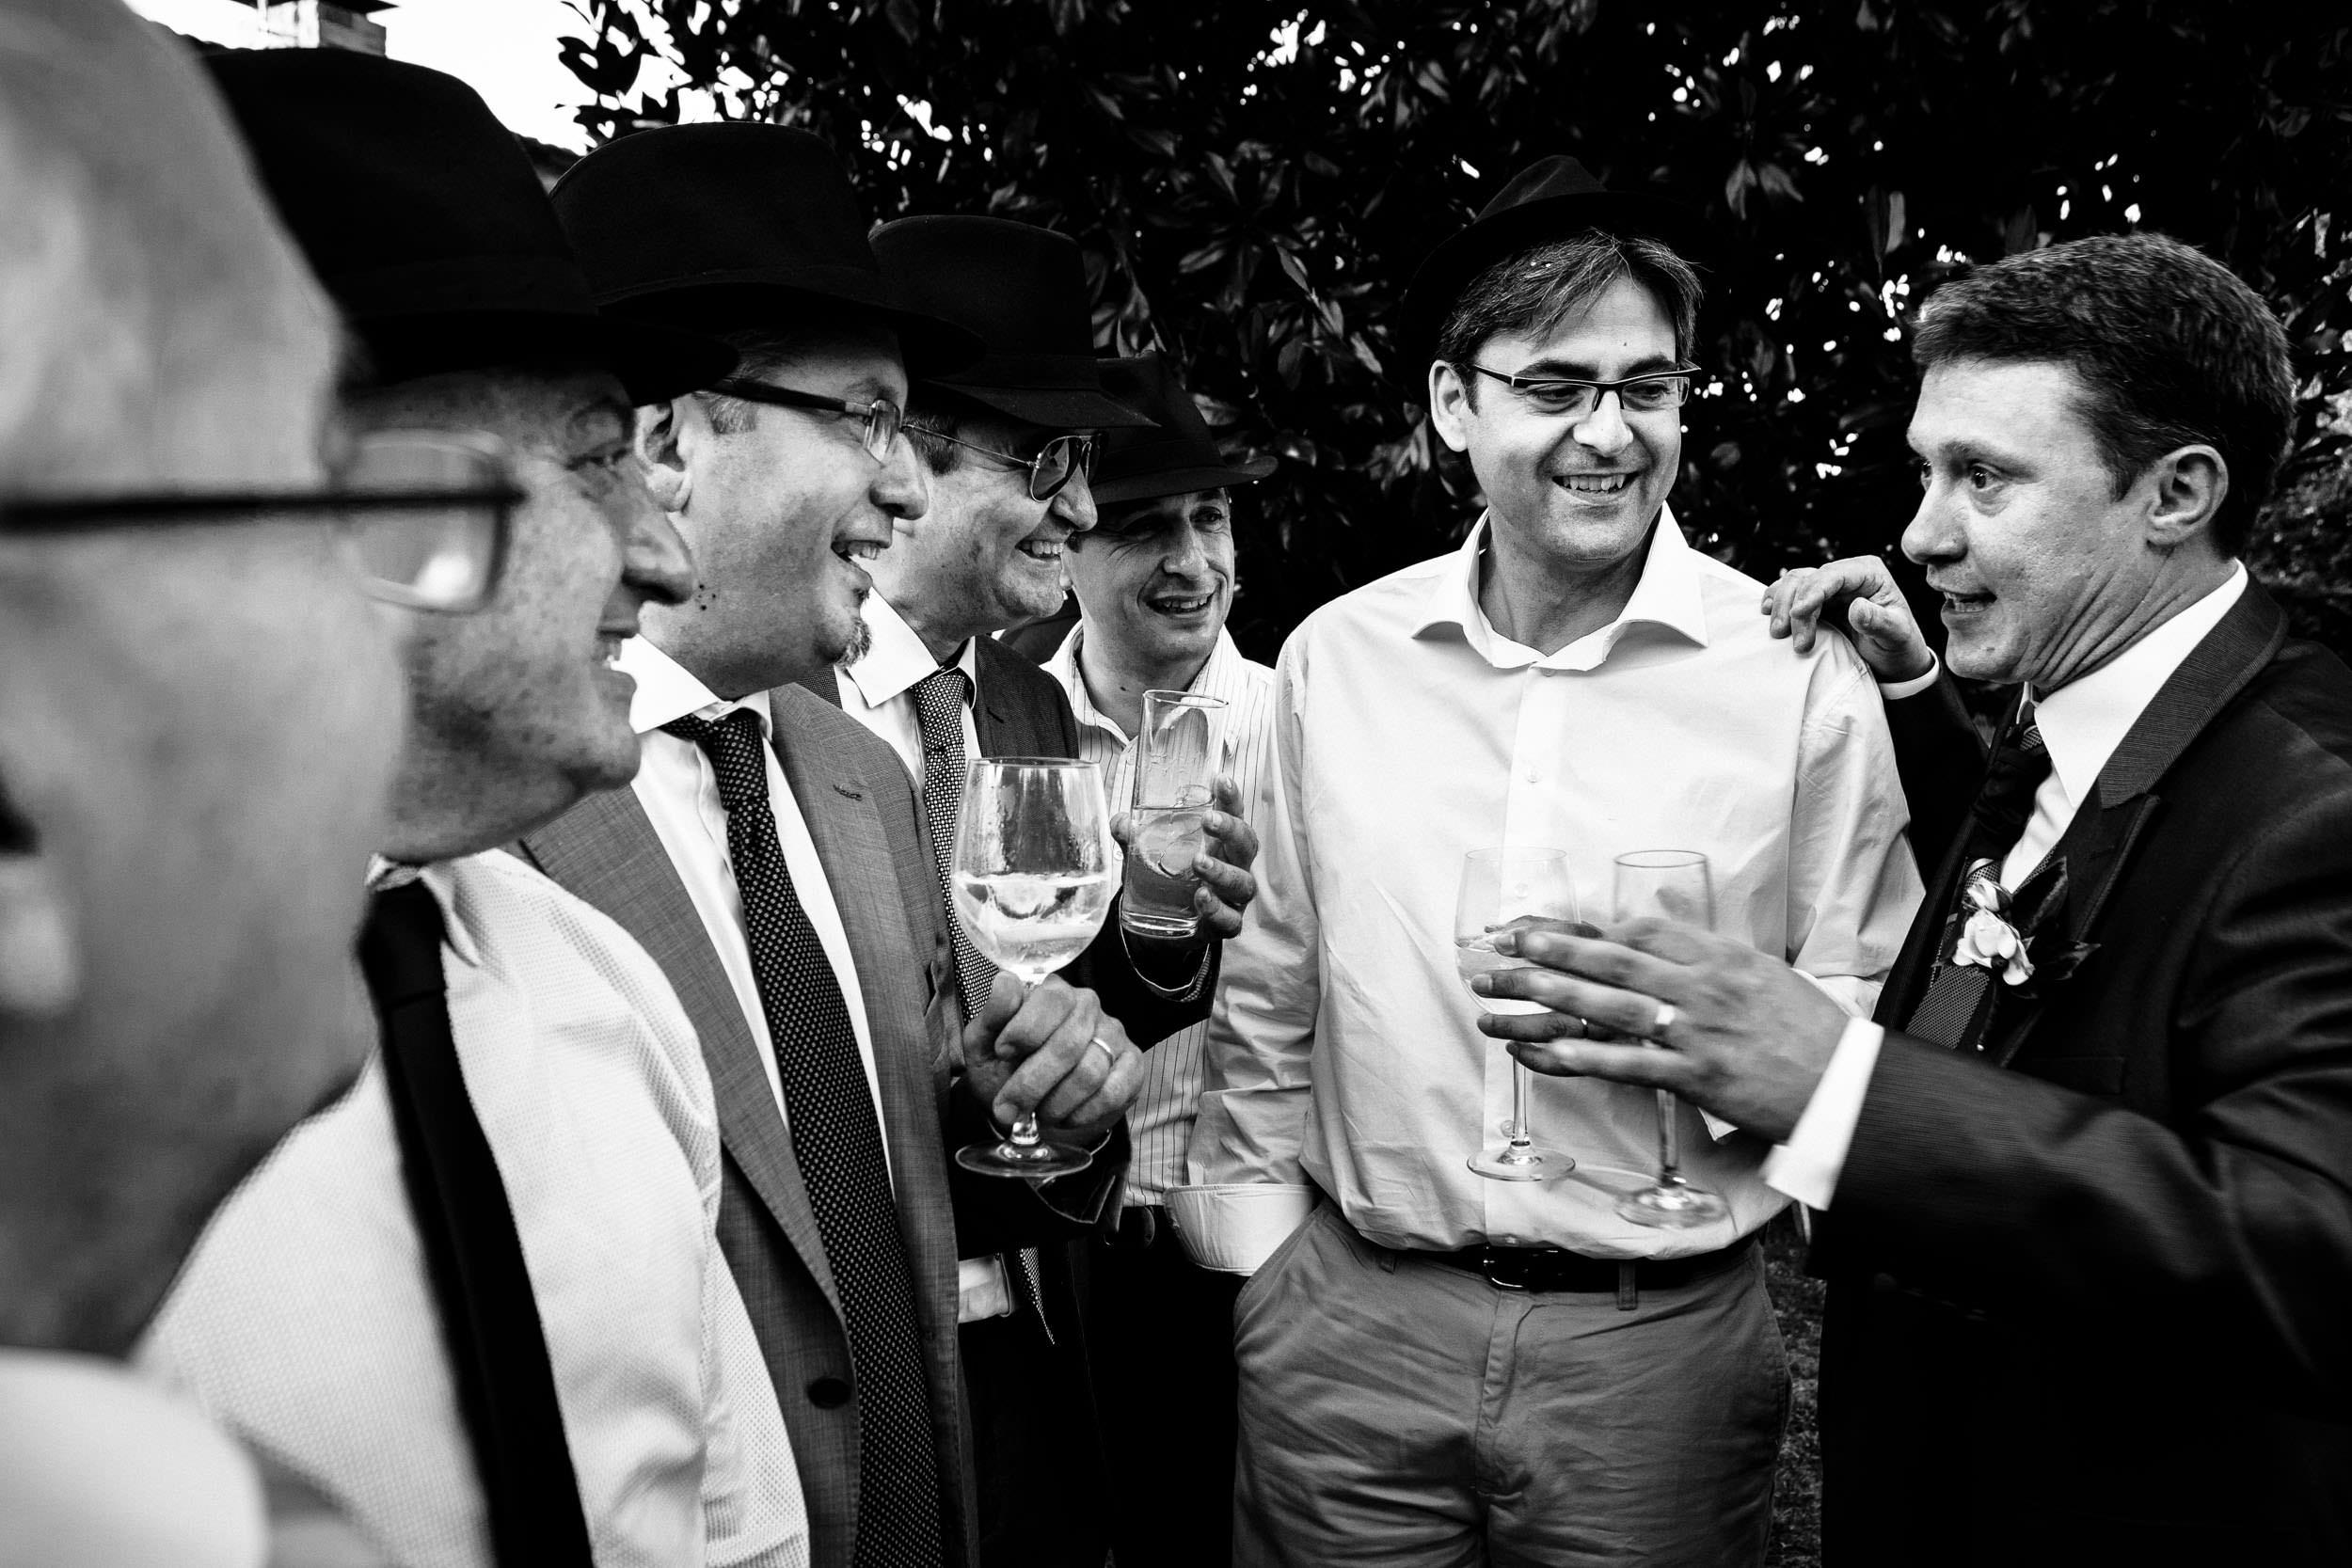 Destination Wedding   Vil.la Sabat Sant Cugat del Valles Barcelona Catalonia Spain - James Sturcke  Photographer   sturcke.org_010.jpg